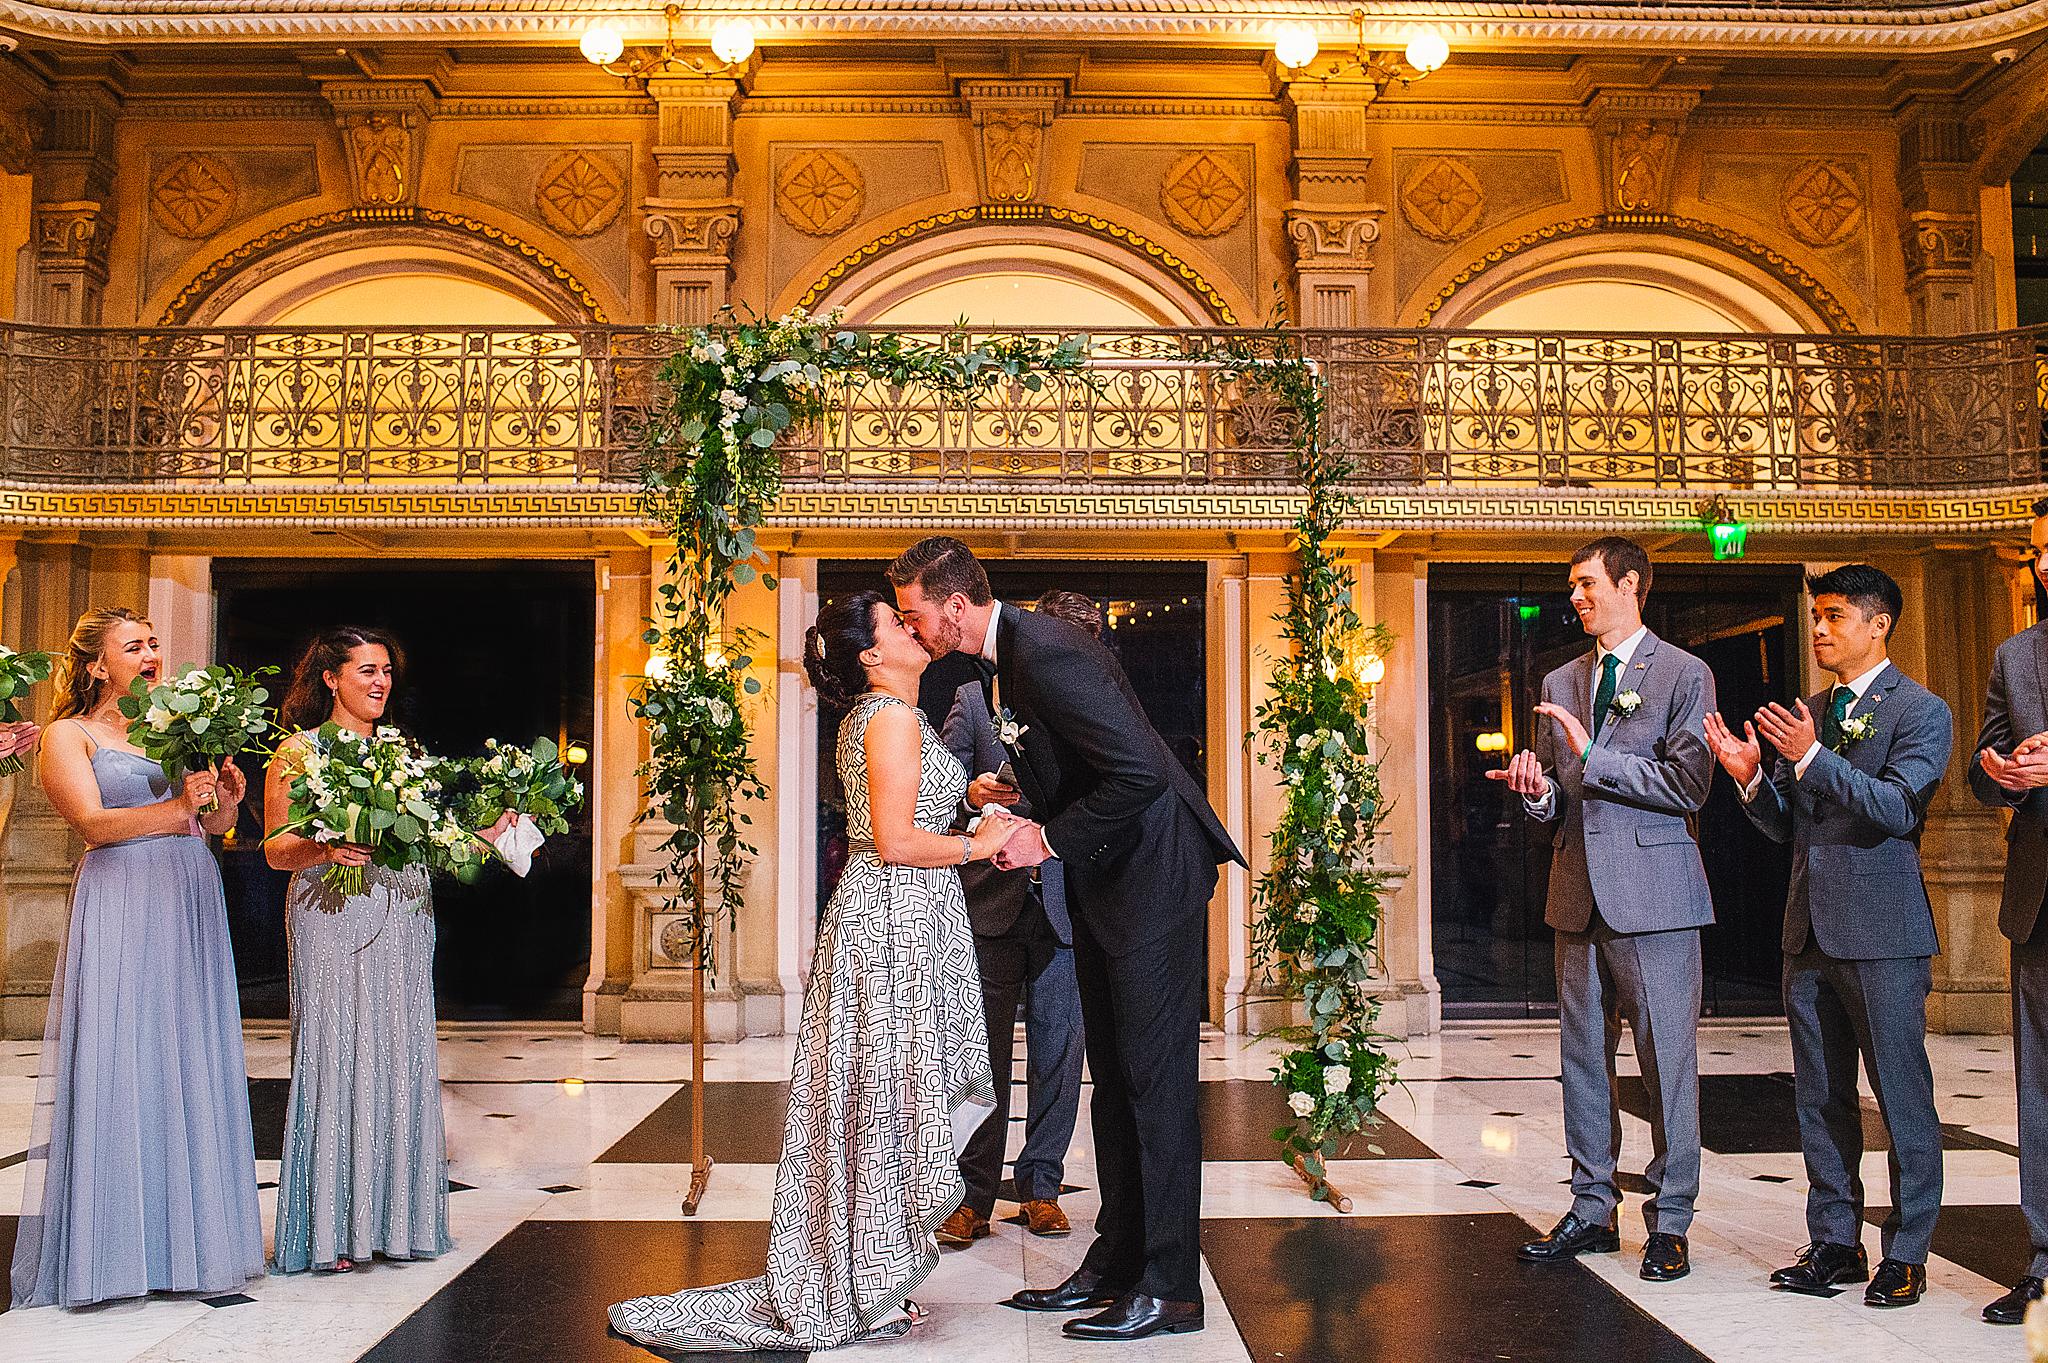 Adibe Photography - George Peabody Libray wedding-37.jpg